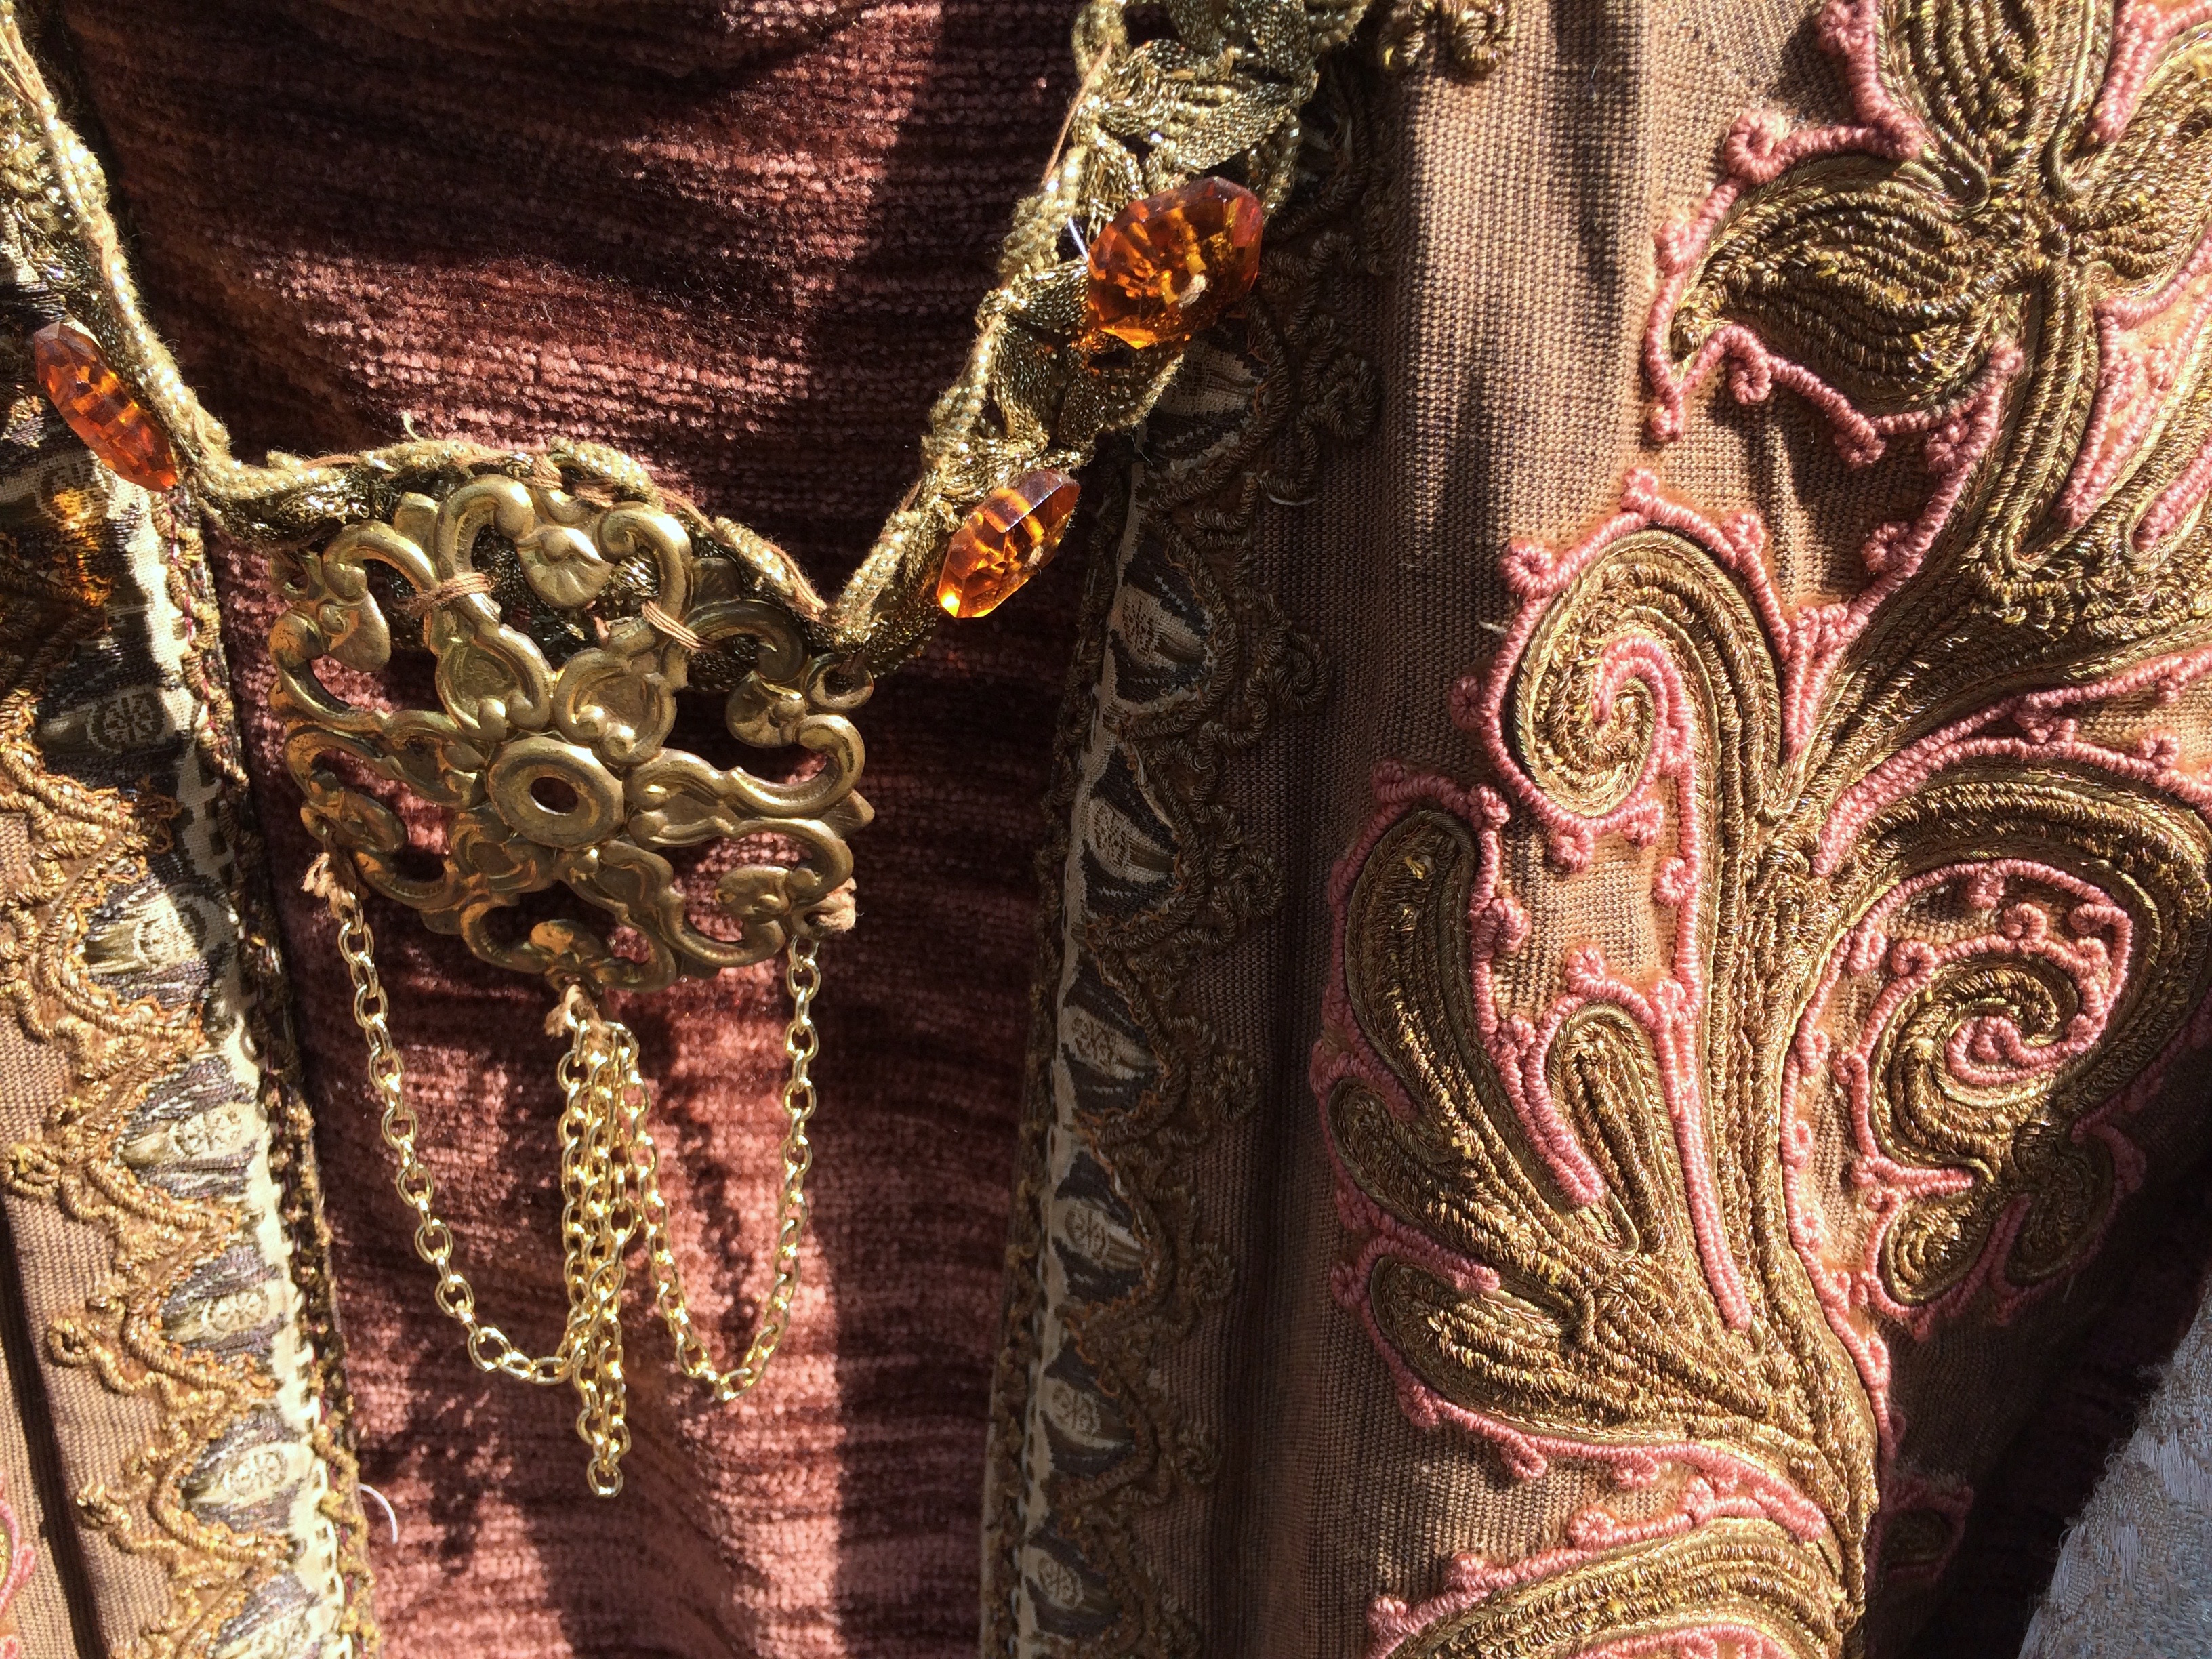 Mittelalter & Renaicance